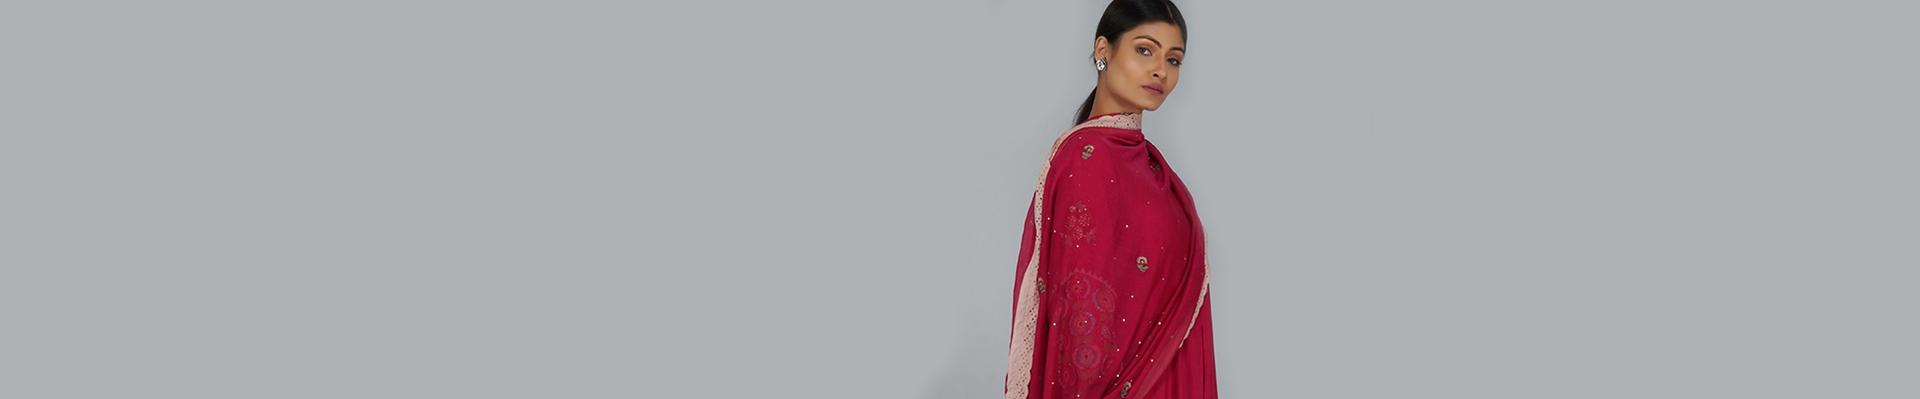 Devyani Mehrotra